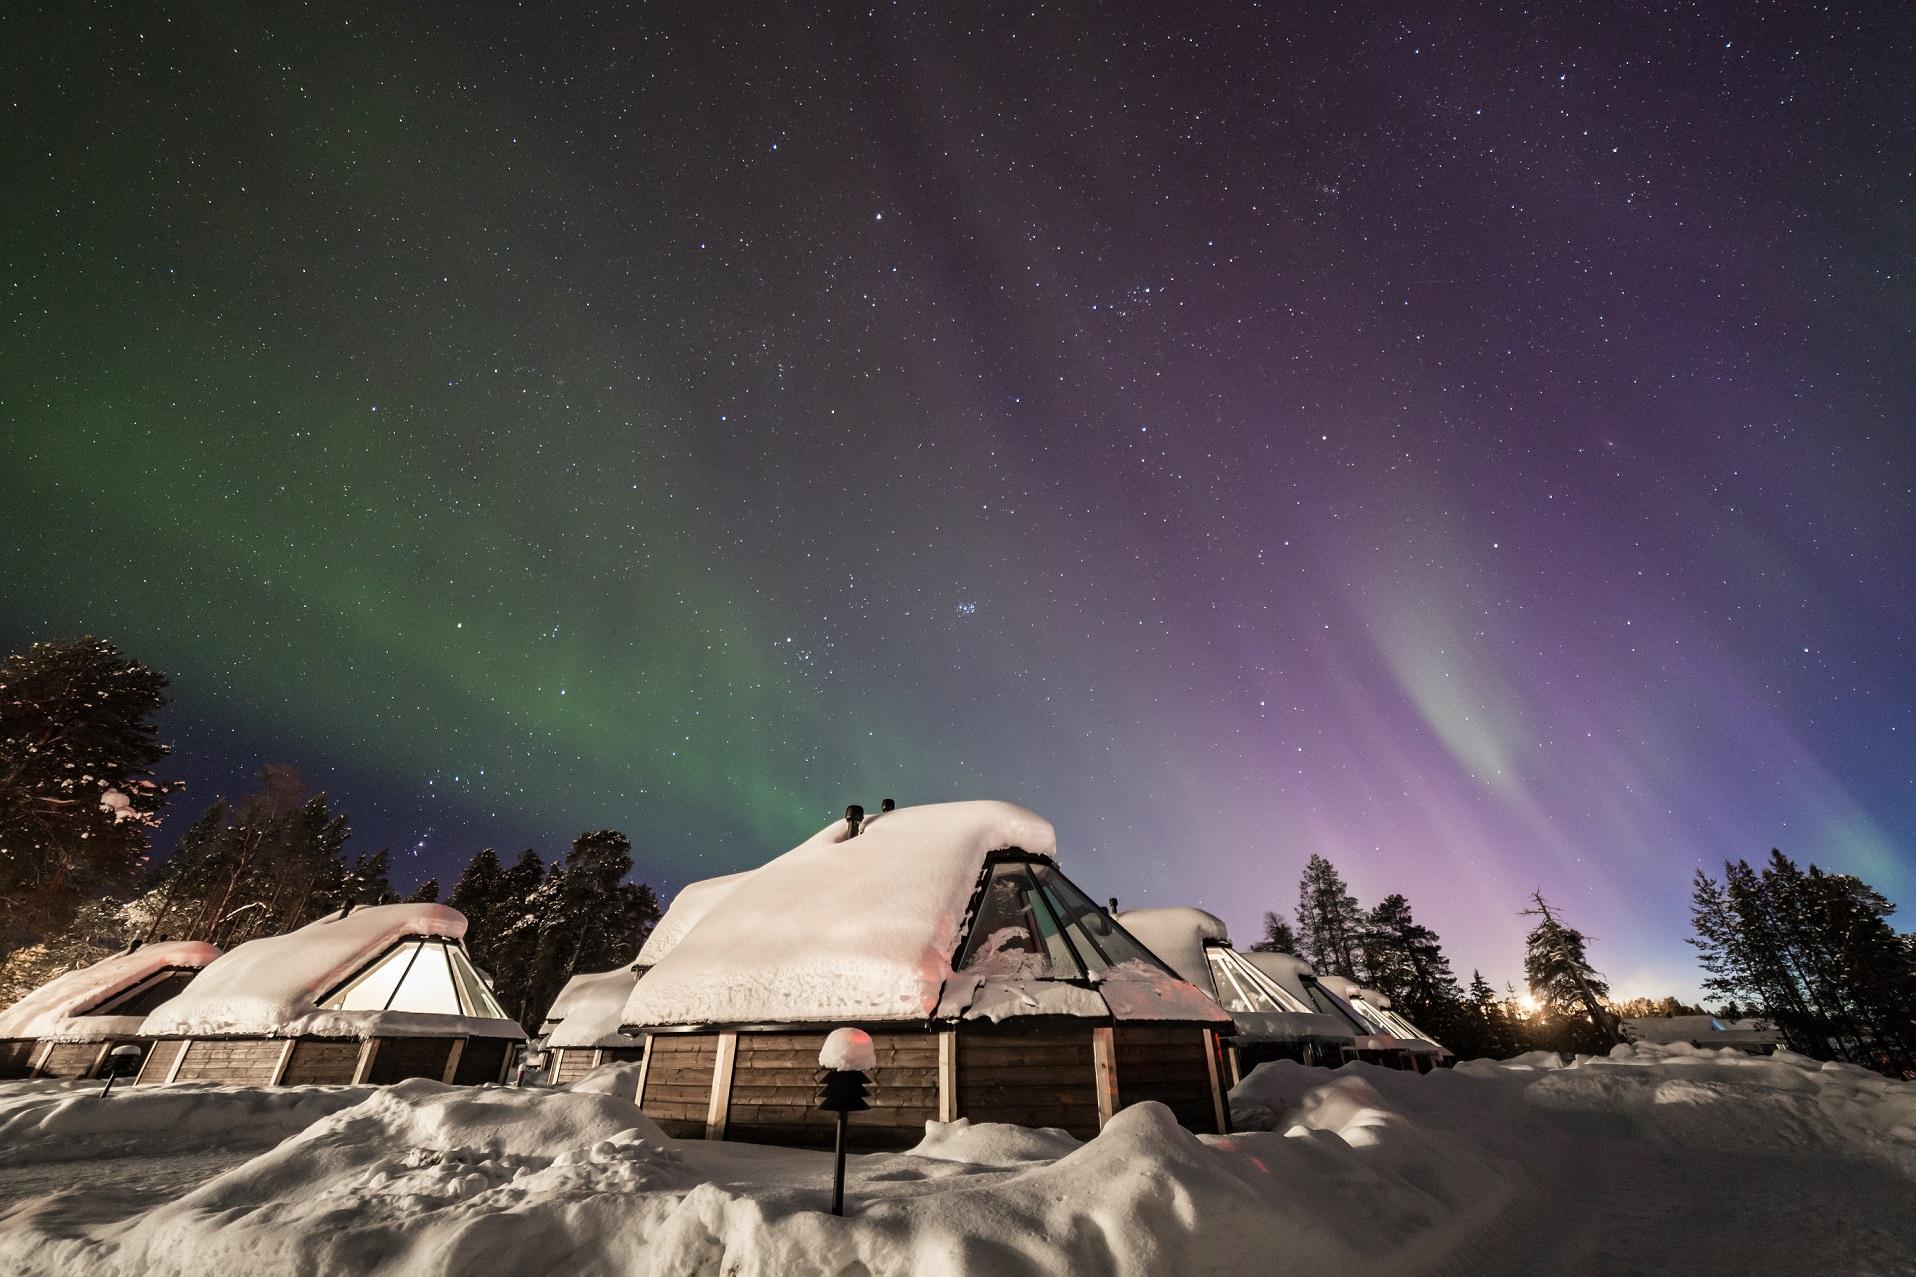 IMG 2896 Inari Credit Matt Robinson